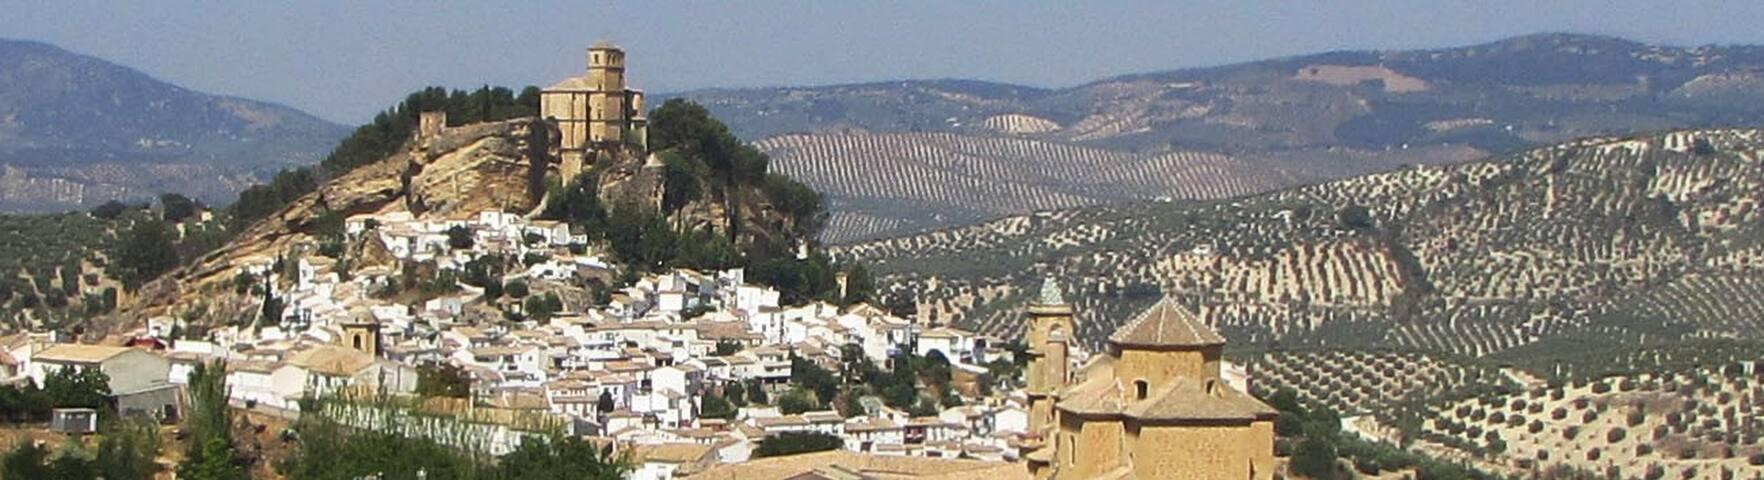 Casa Castillo - Montefrío - fantastic views - pool